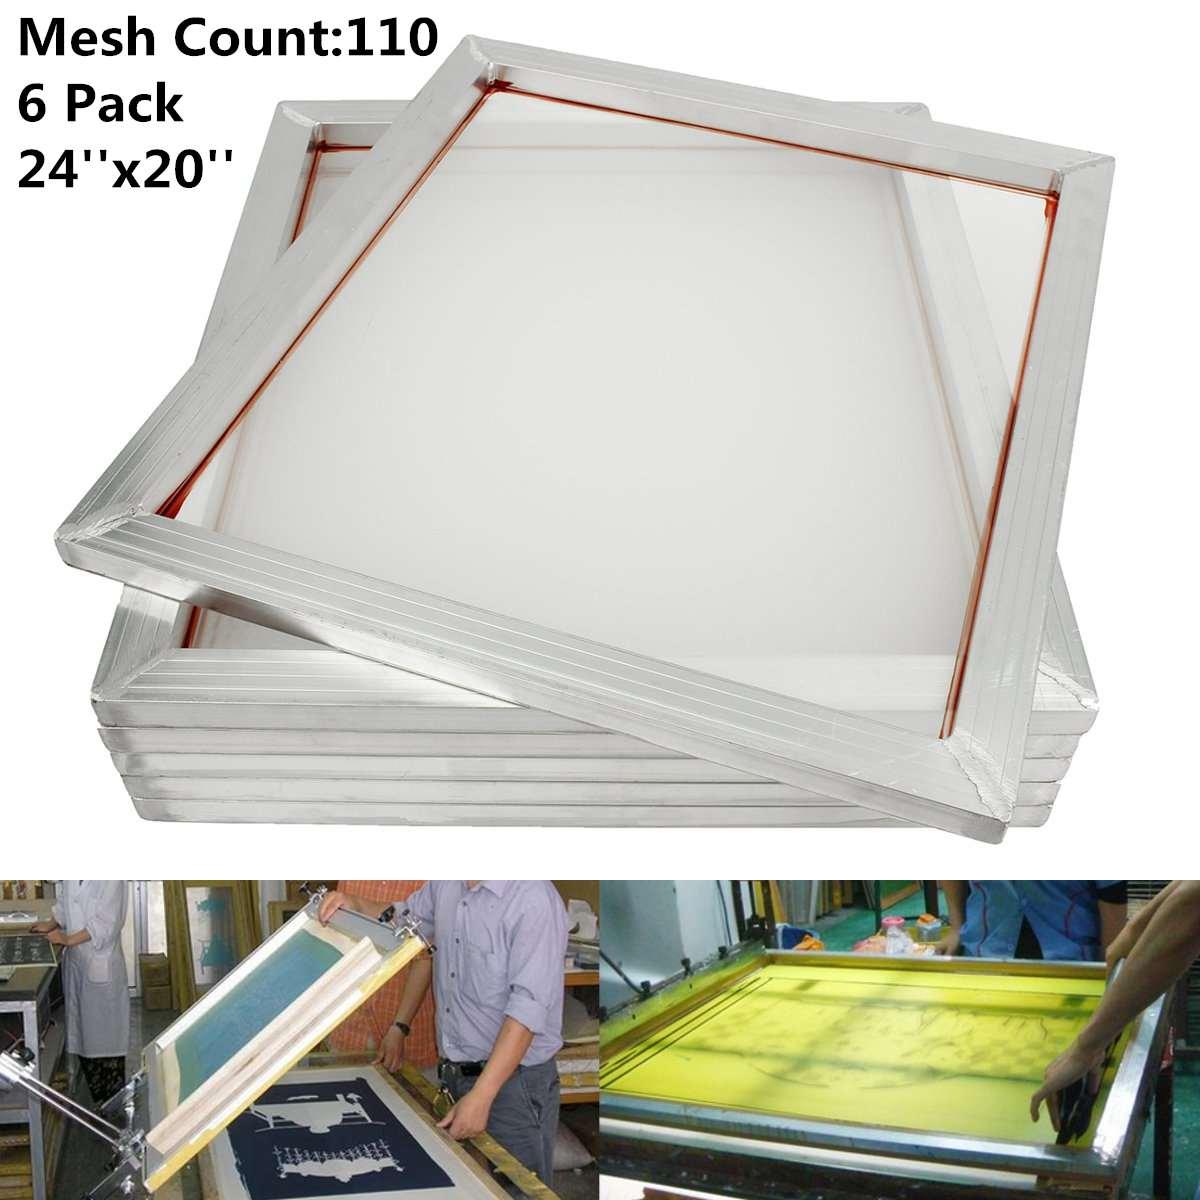 6Pcs Set 50X60cm Aluminum Silk Screen Printing Press Screen Frame 110 Mesh Count for High precision Printed Circuit Boards